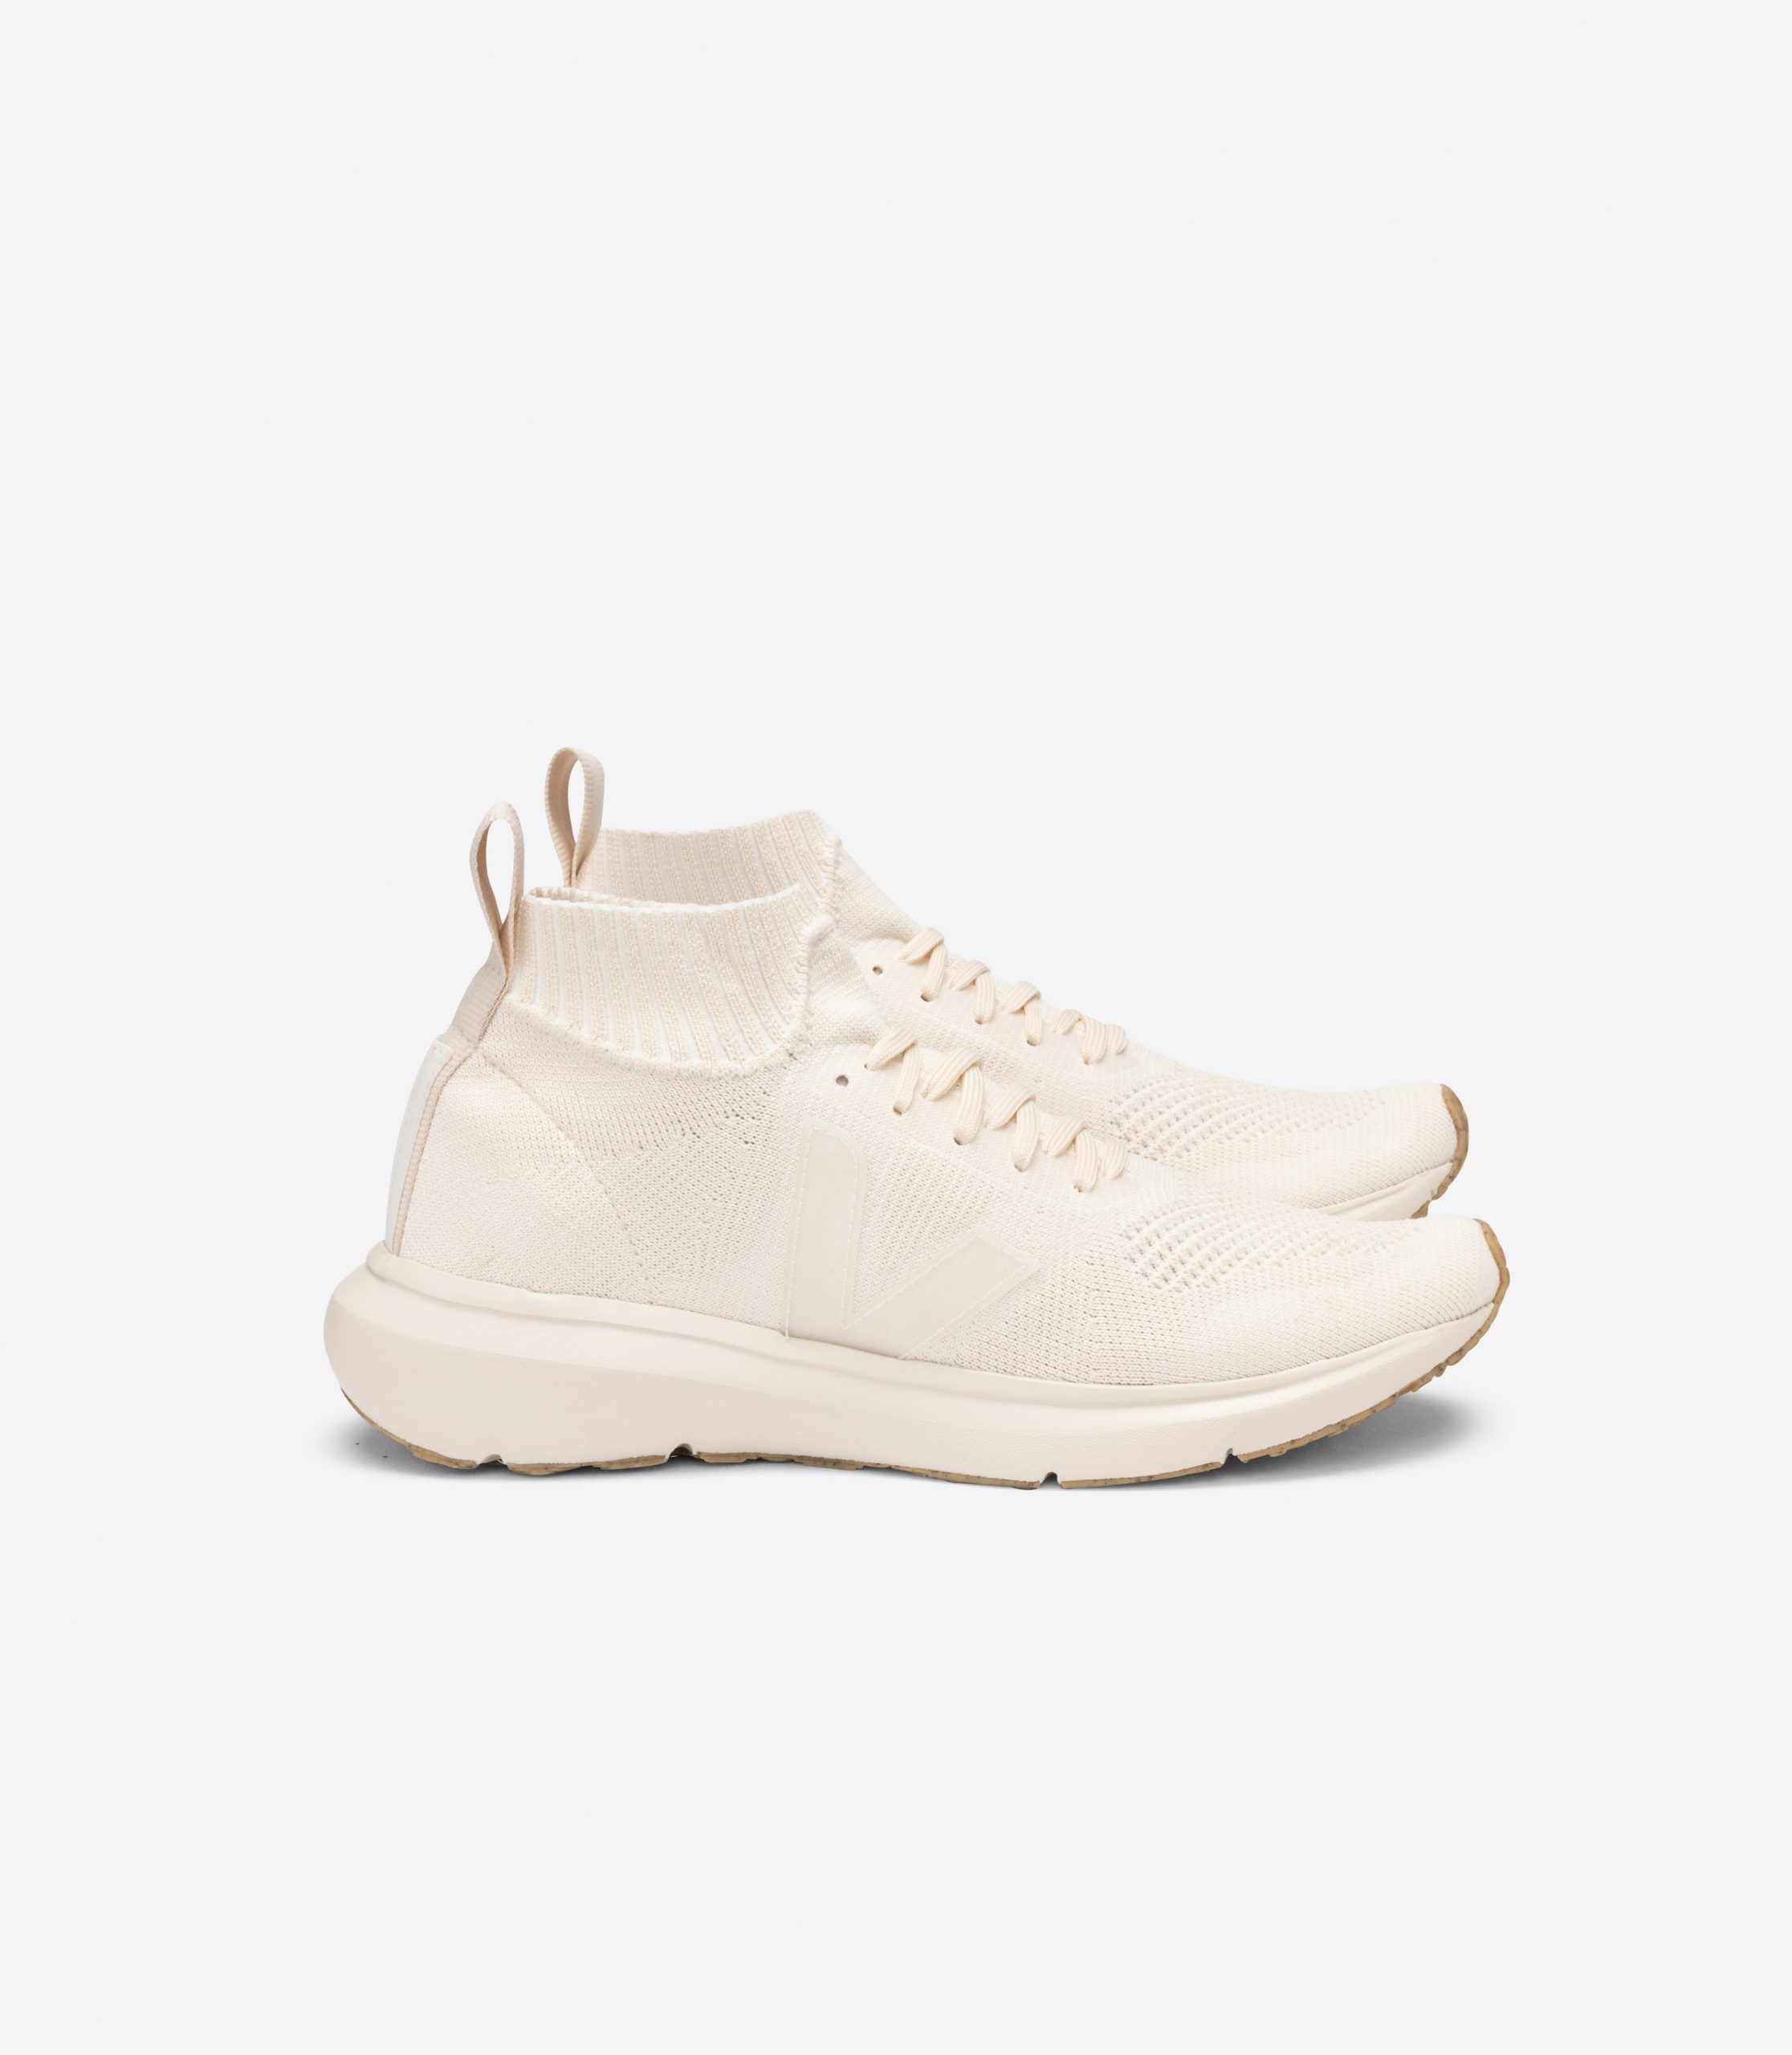 Sneaker Veja Rick Owens